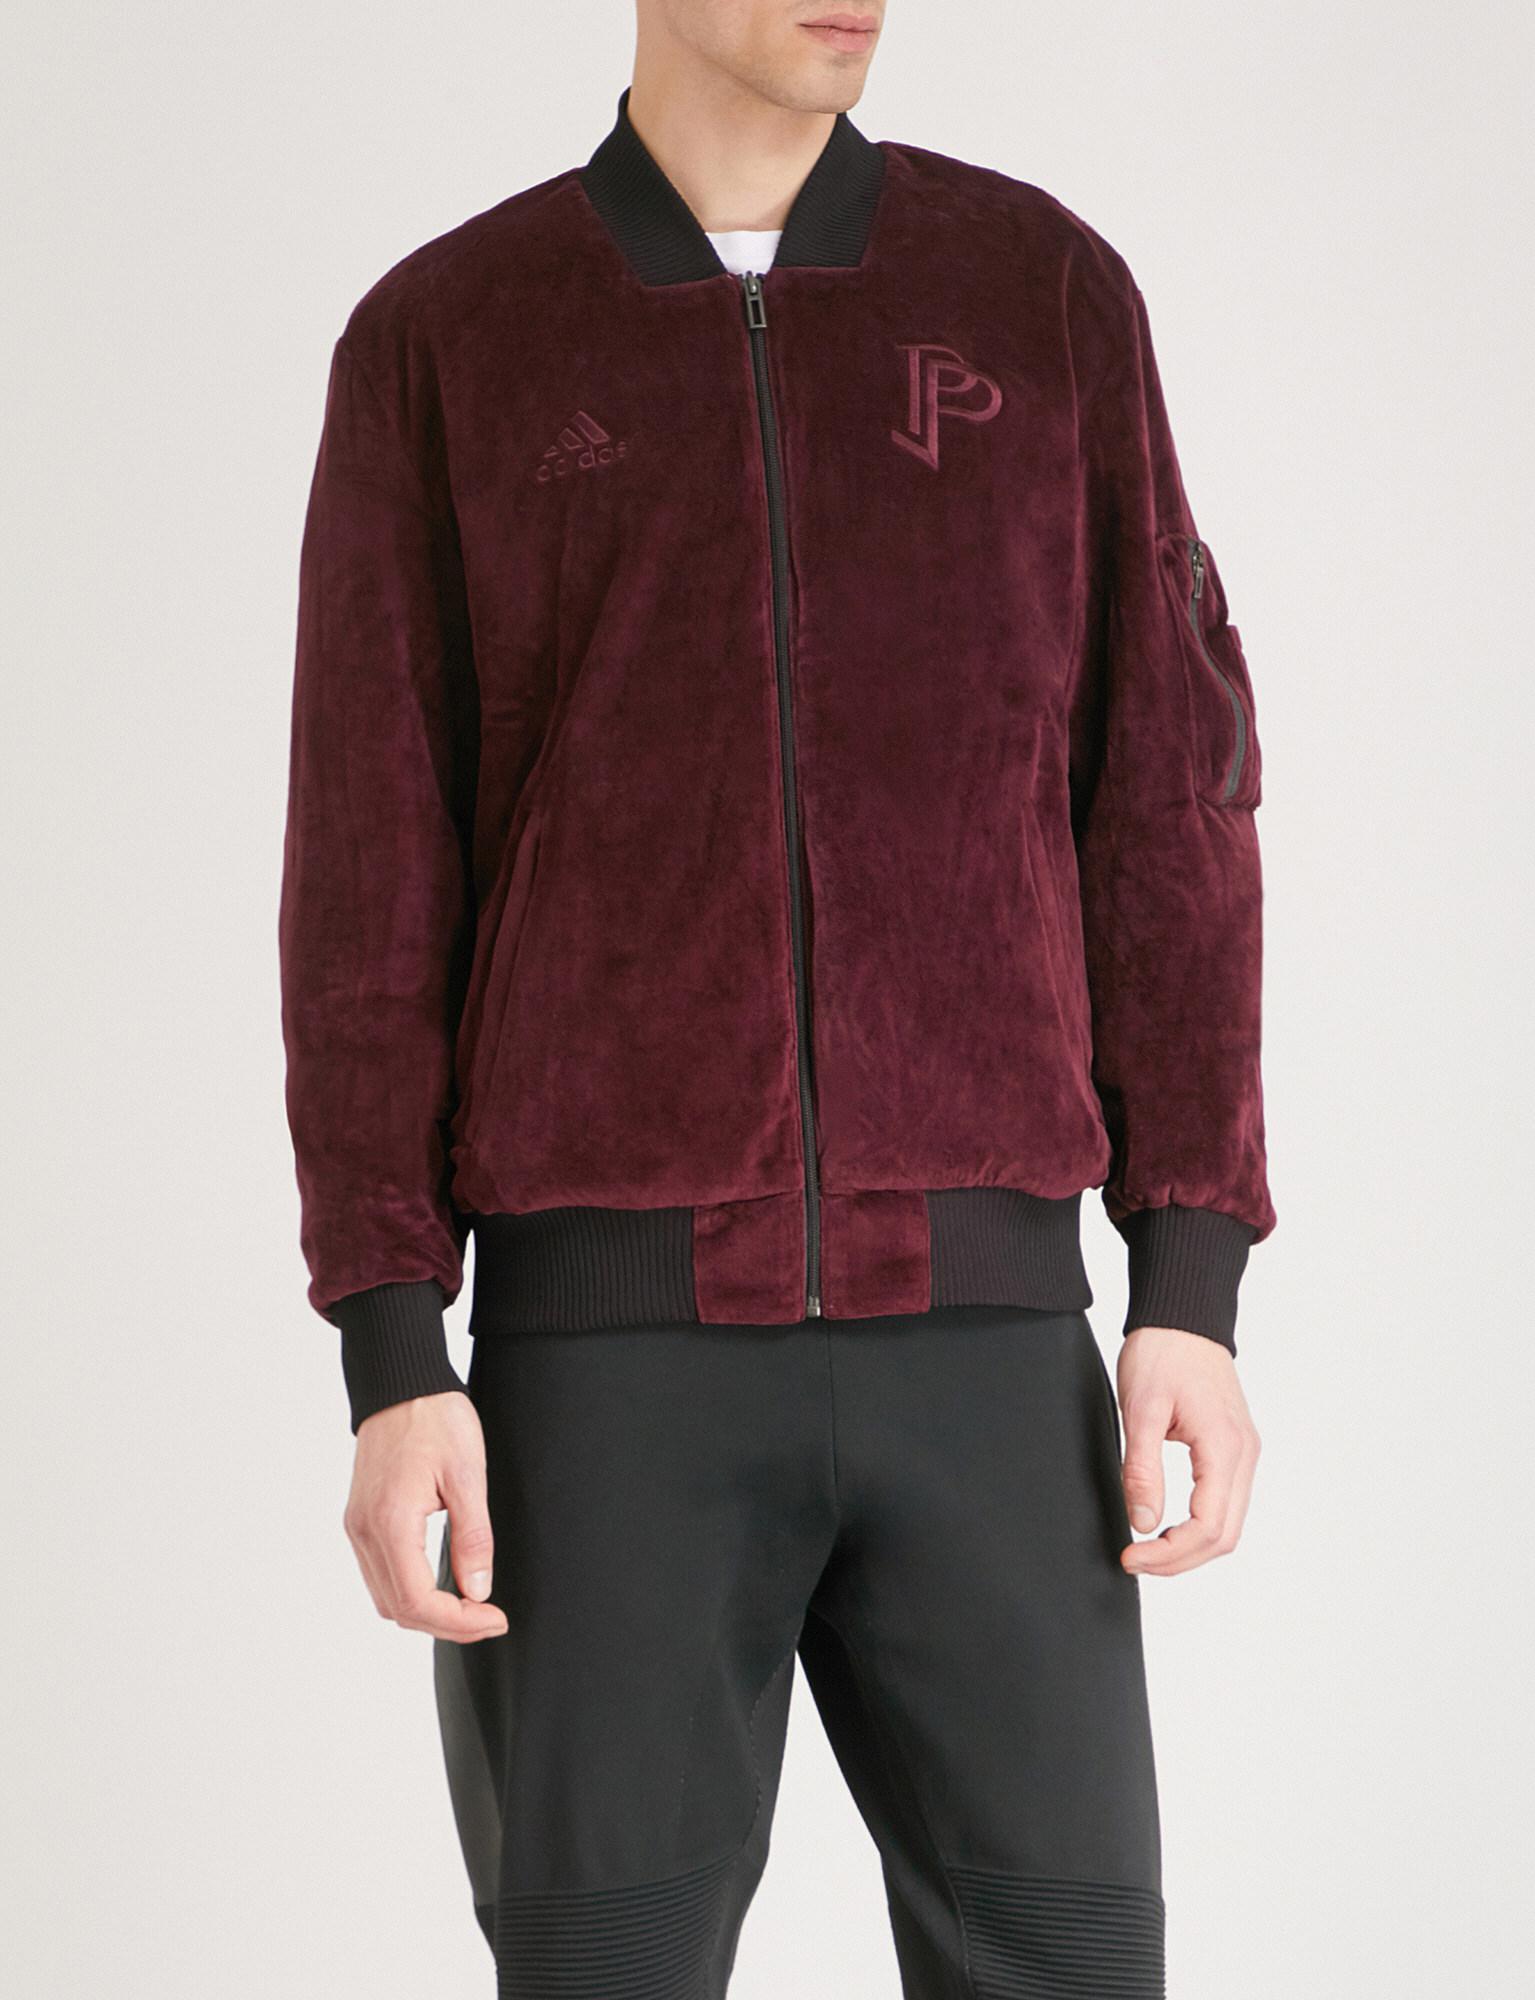 6e74a0a6c540 adidas paul pogba reversible velvet bomber jacket for men – lyst. Download  Image 1535 X 2000